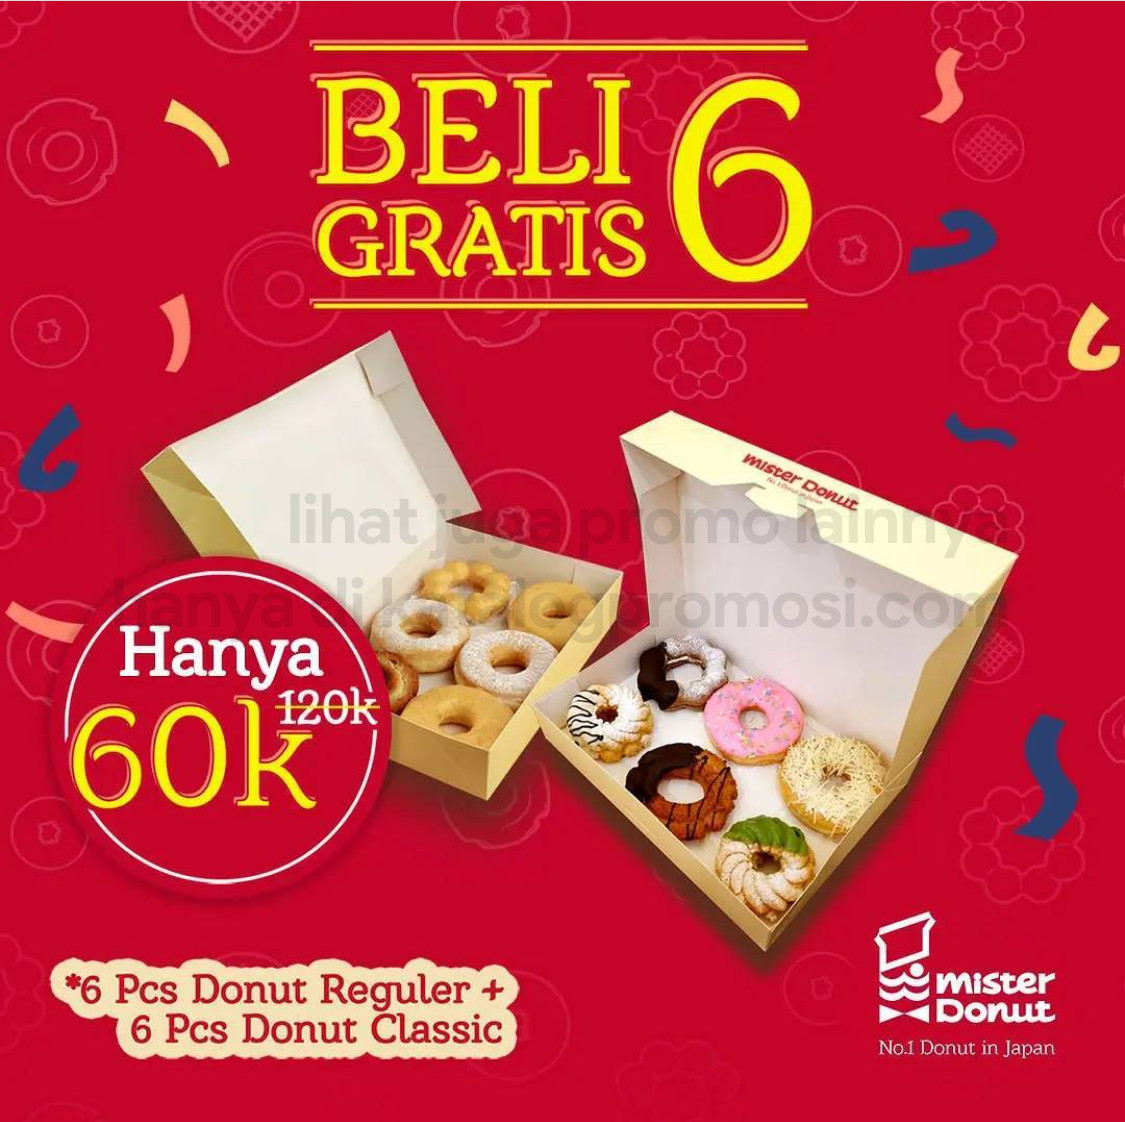 Mister Donut Promo BELI 6 GRATIS 6 khusus outlet FX Sudirman